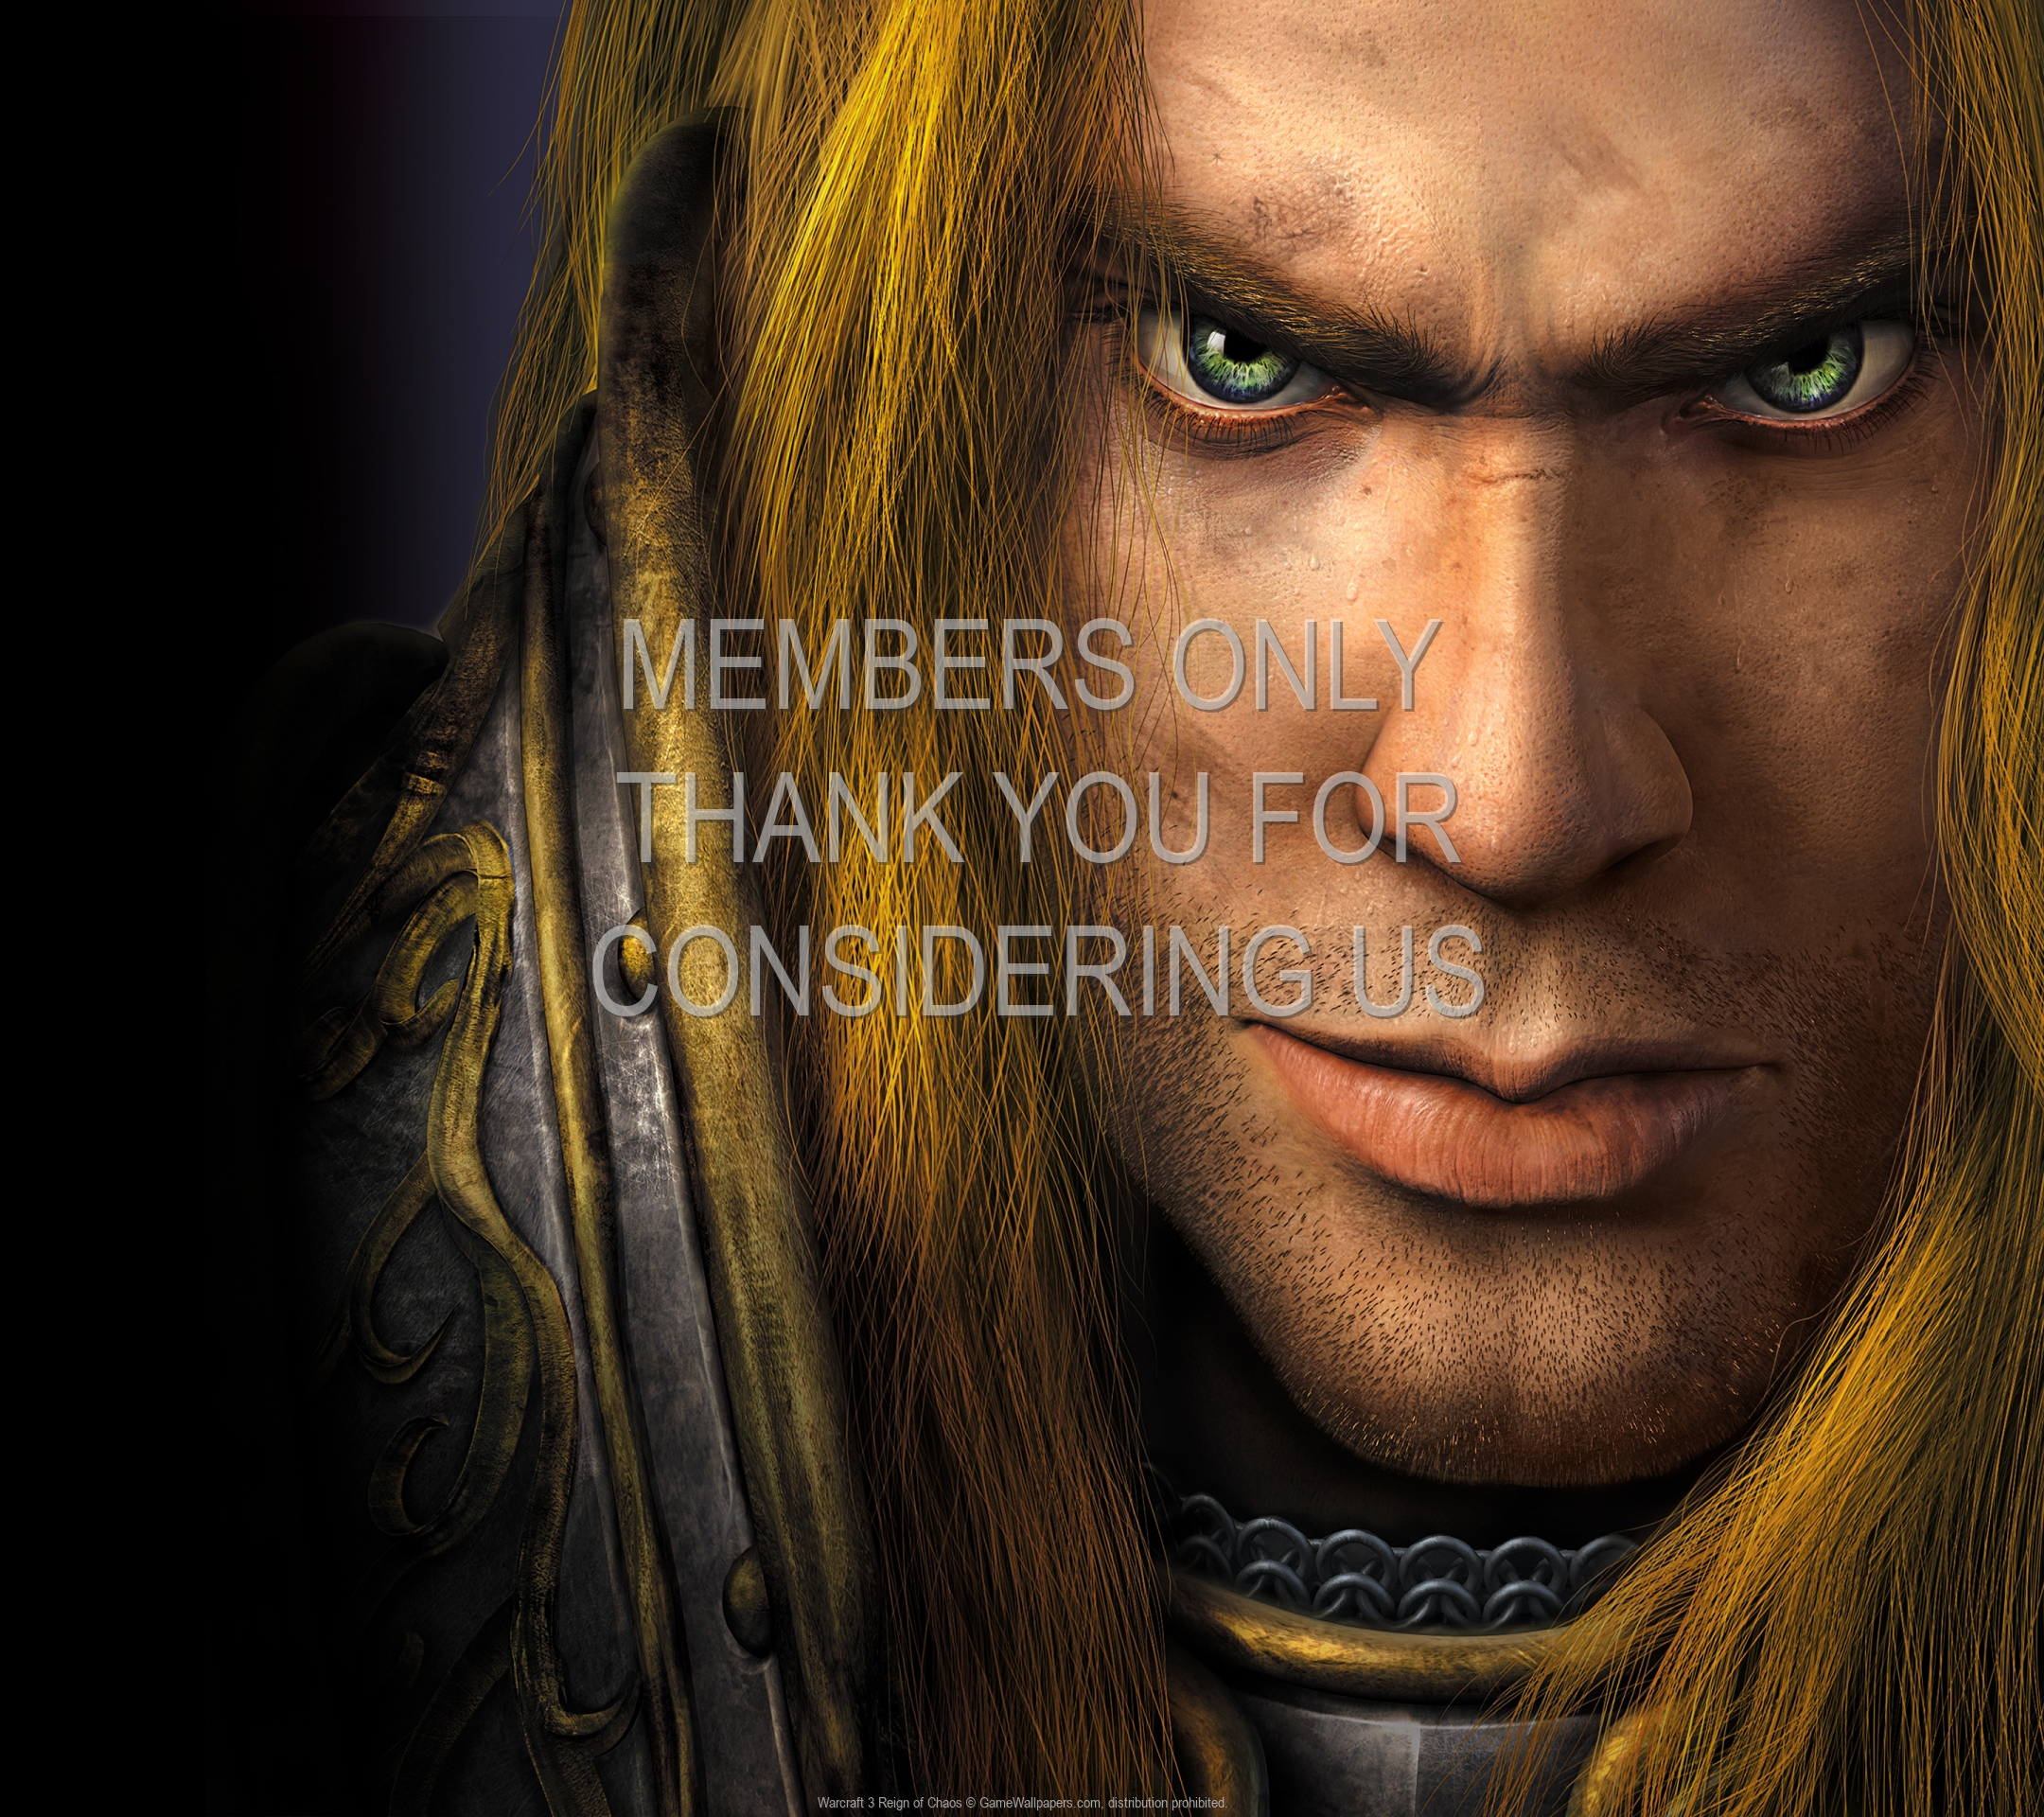 Warcraft 3: Reign of Chaos 1920x1080 Handy Hintergrundbild 24